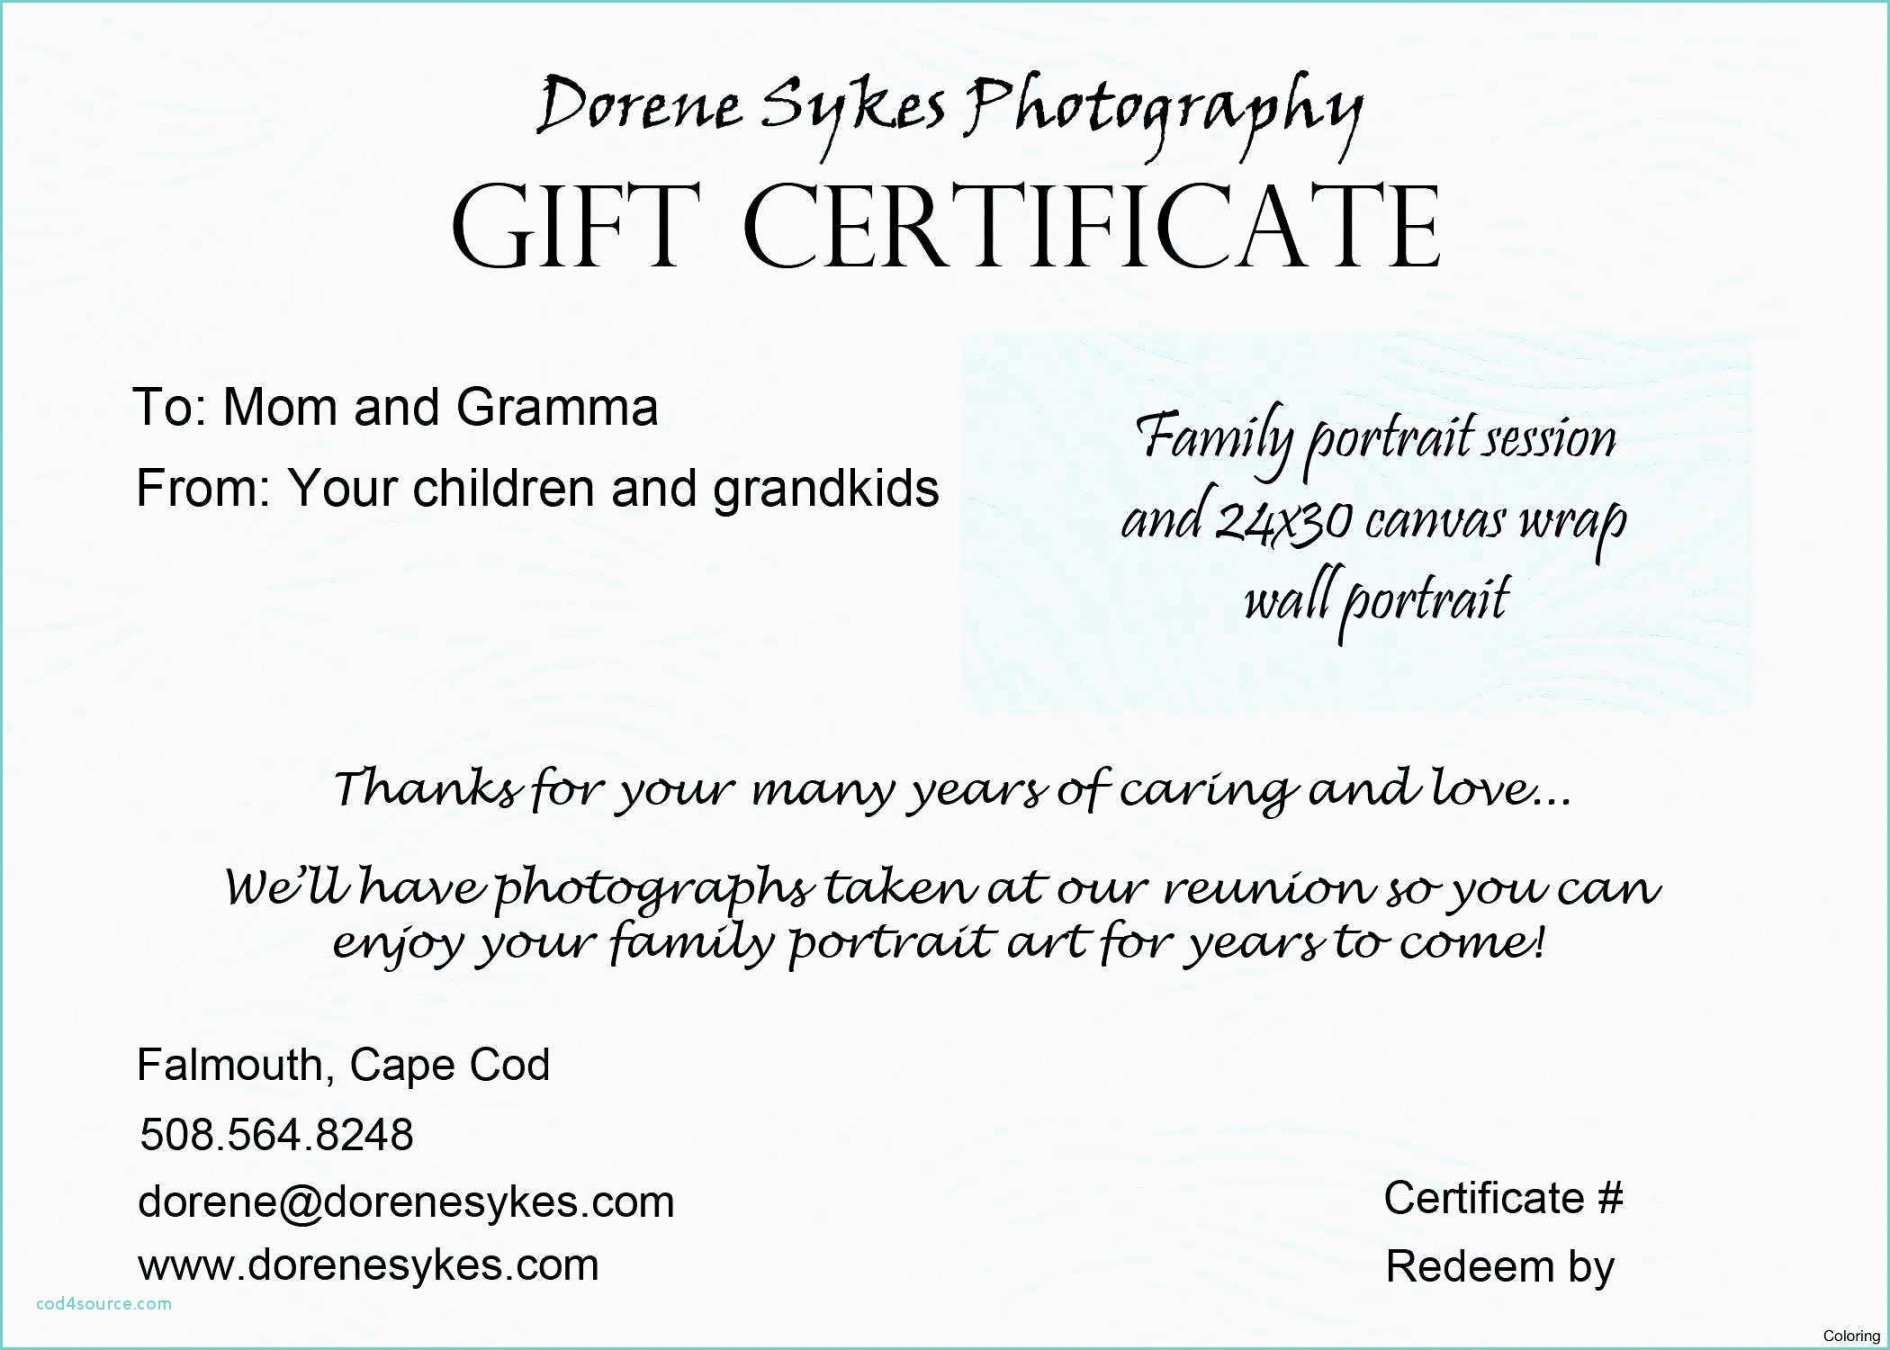 Tattoo Gift Certificate Template Free | Emetonlineblog - Free Printable Tattoo Gift Certificates